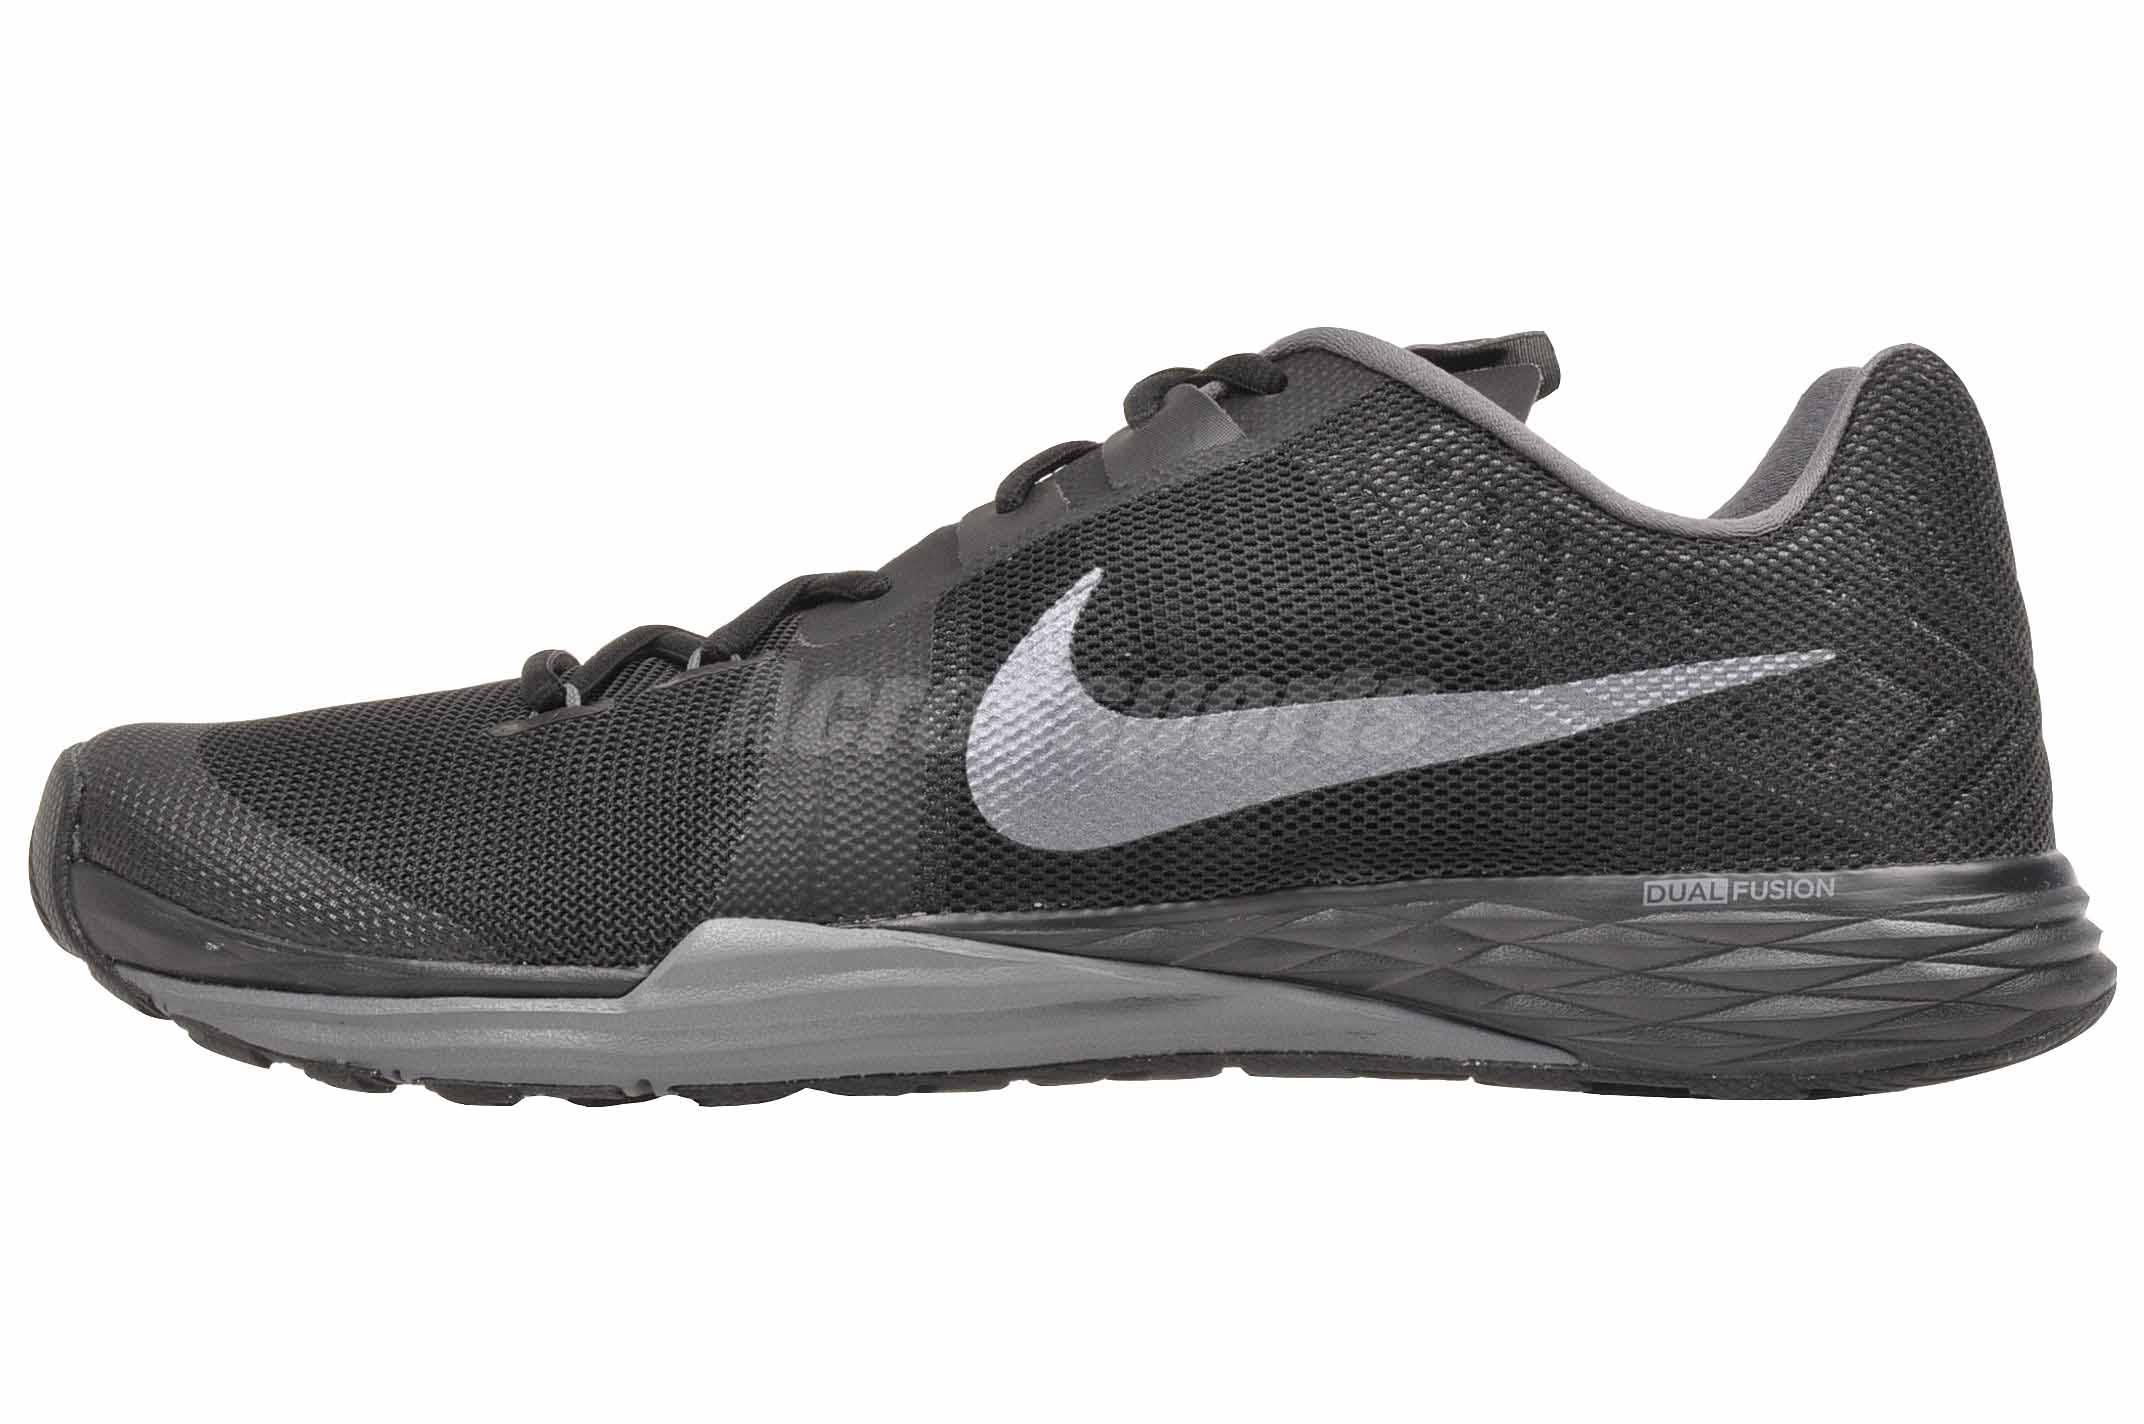 lowest price afe31 4409c Nike Train Prime Iron DF Cross Training Mens Shoes Black Gray 832219-007